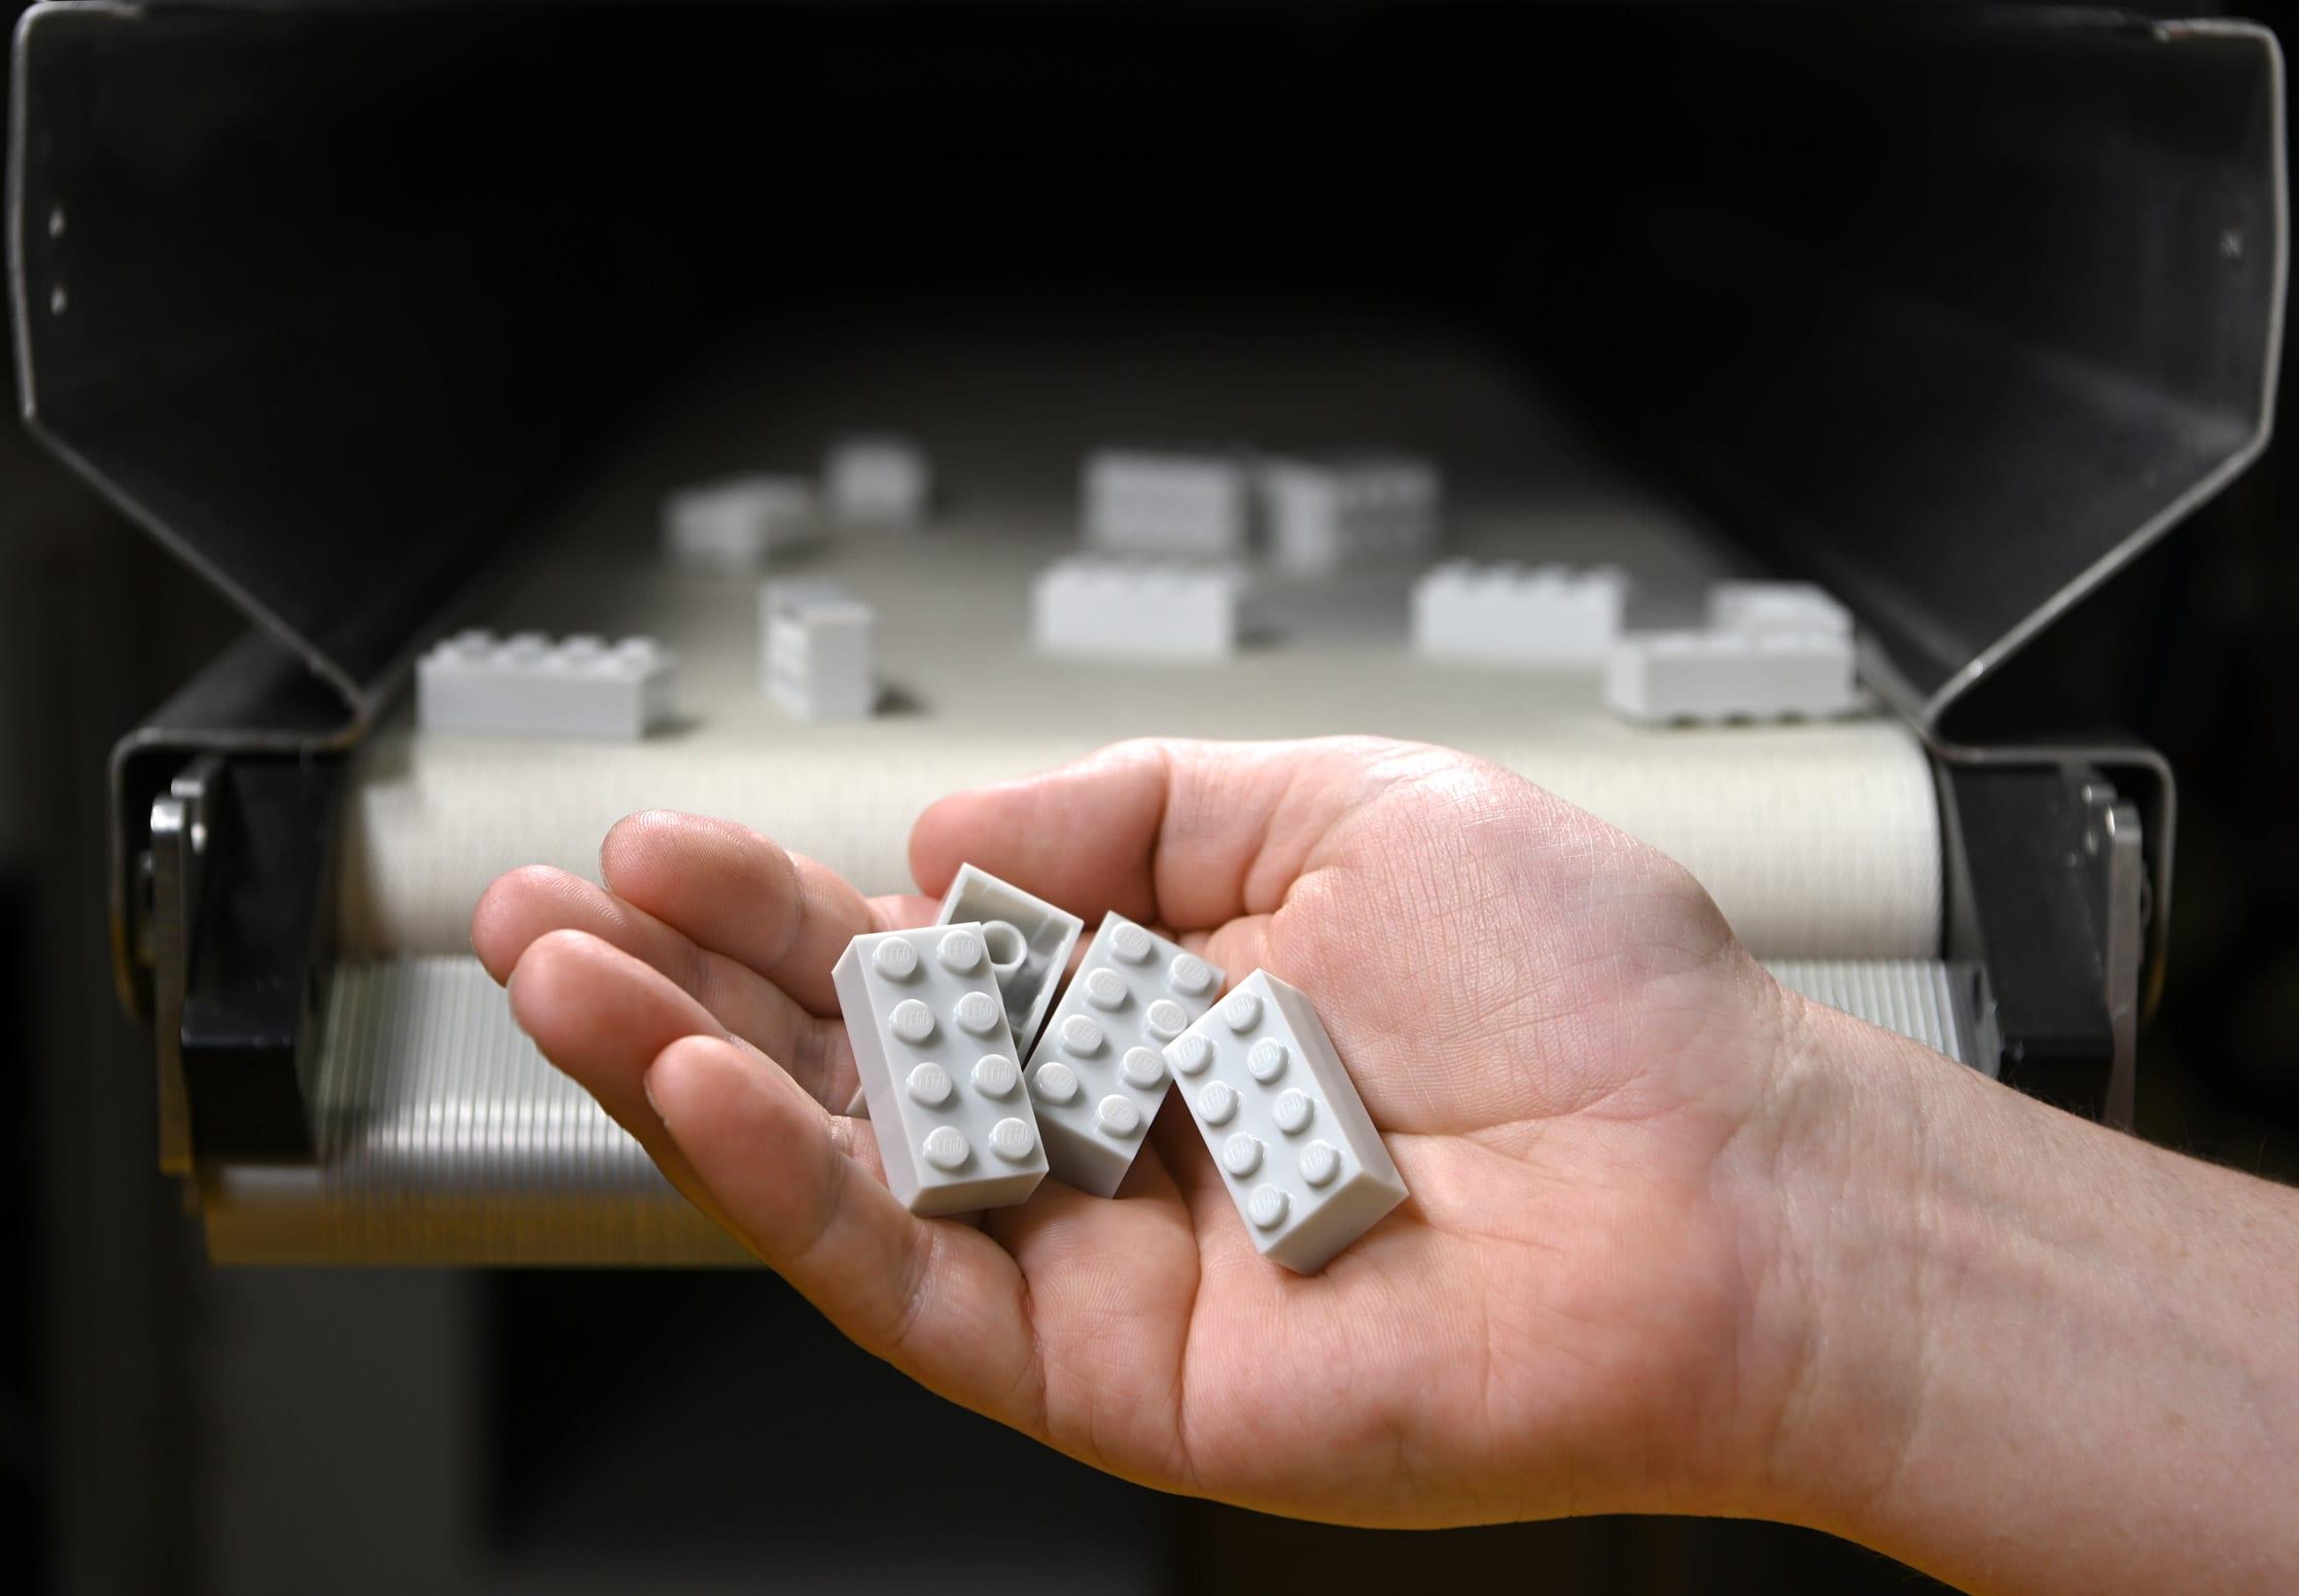 A hand holding 4 Lego bricks